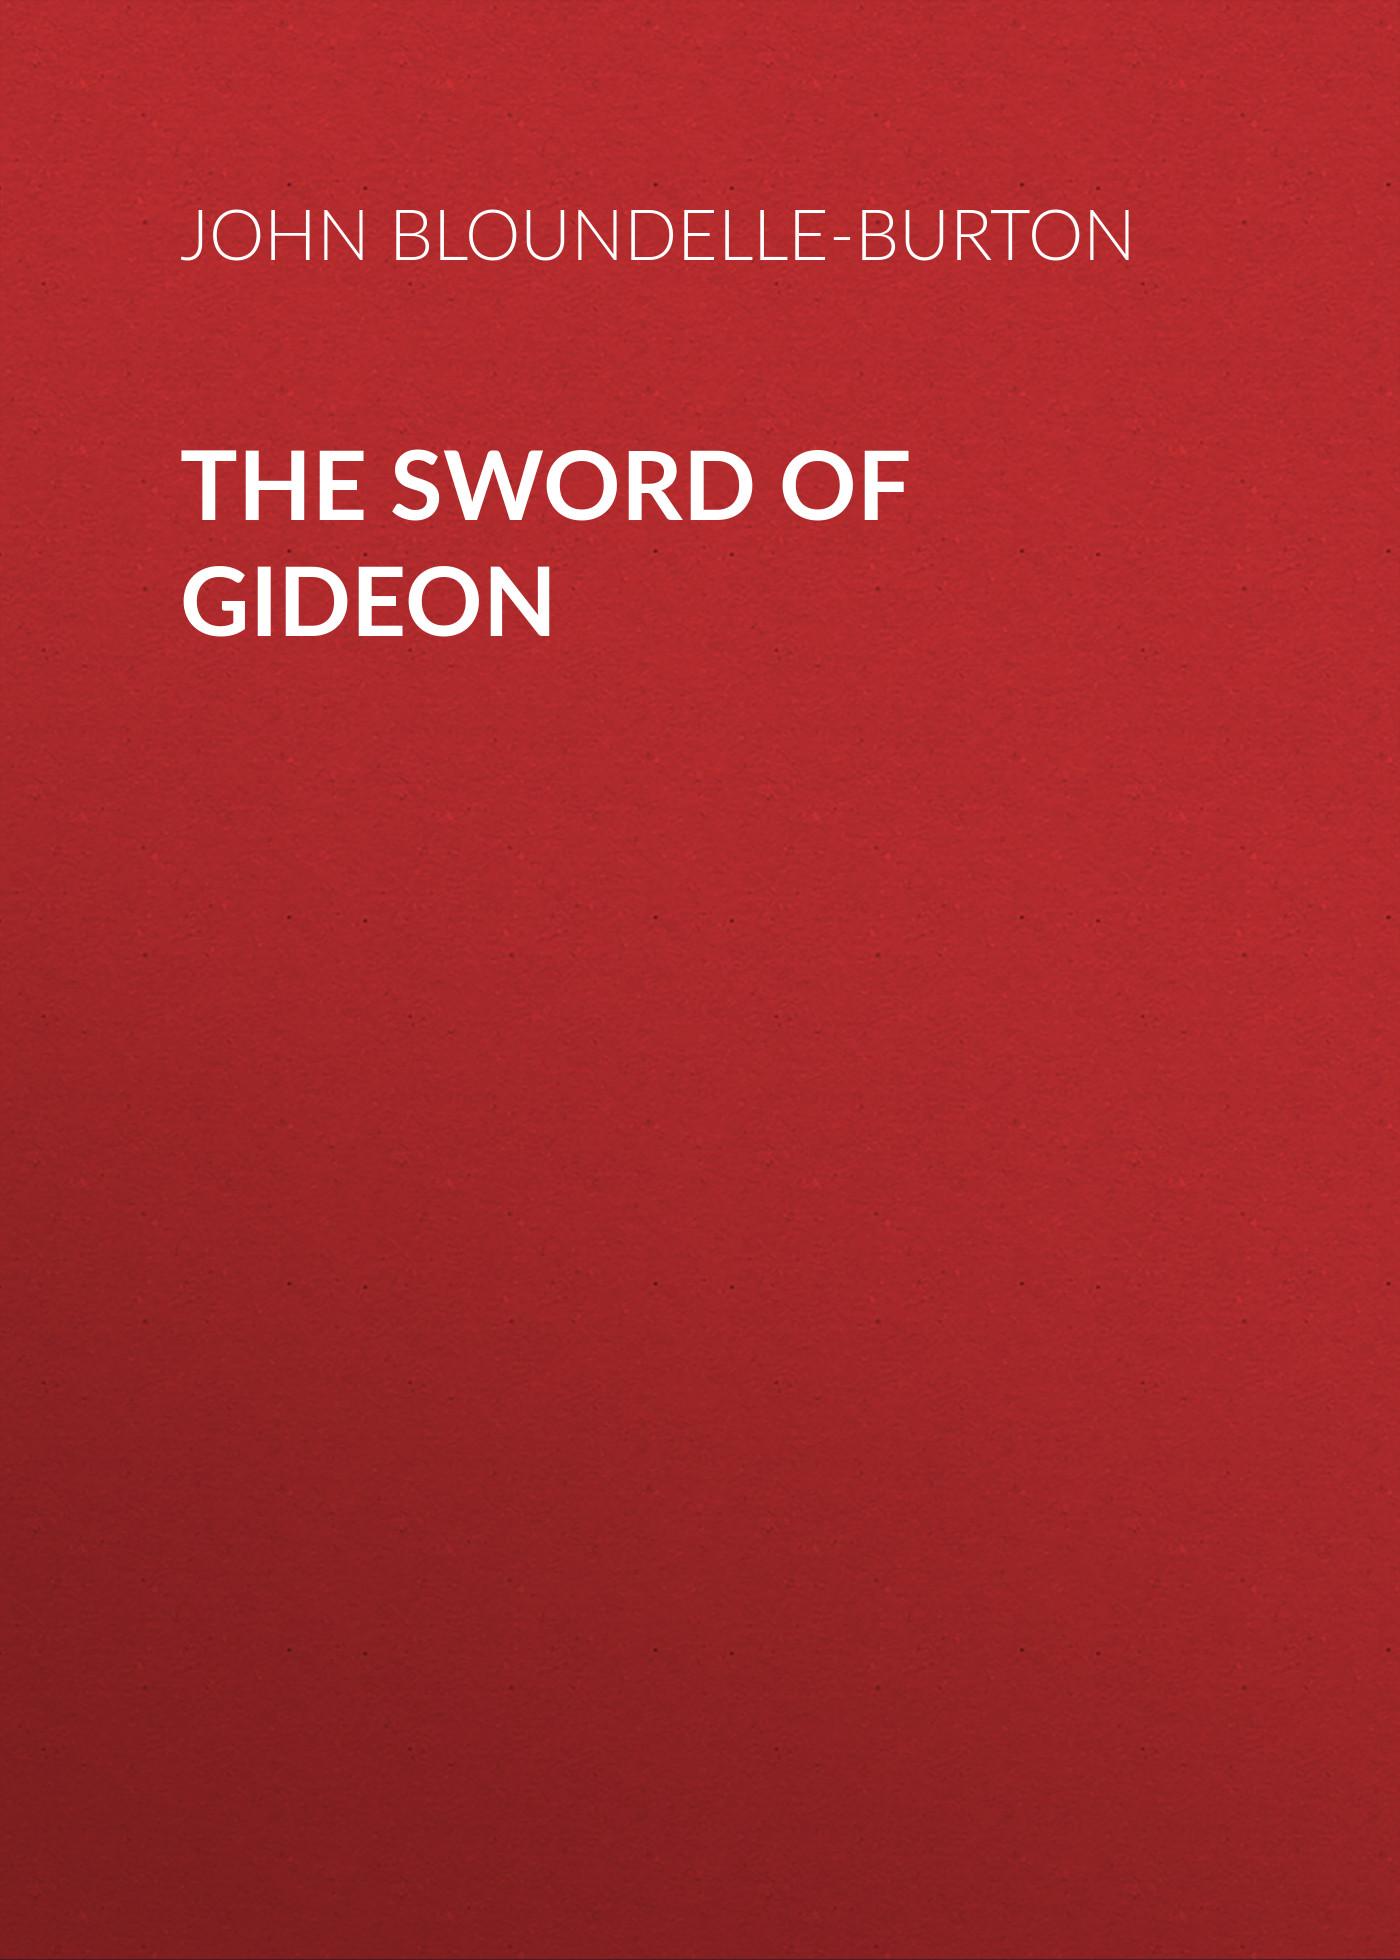 John Bloundelle-Burton The Sword of Gideon